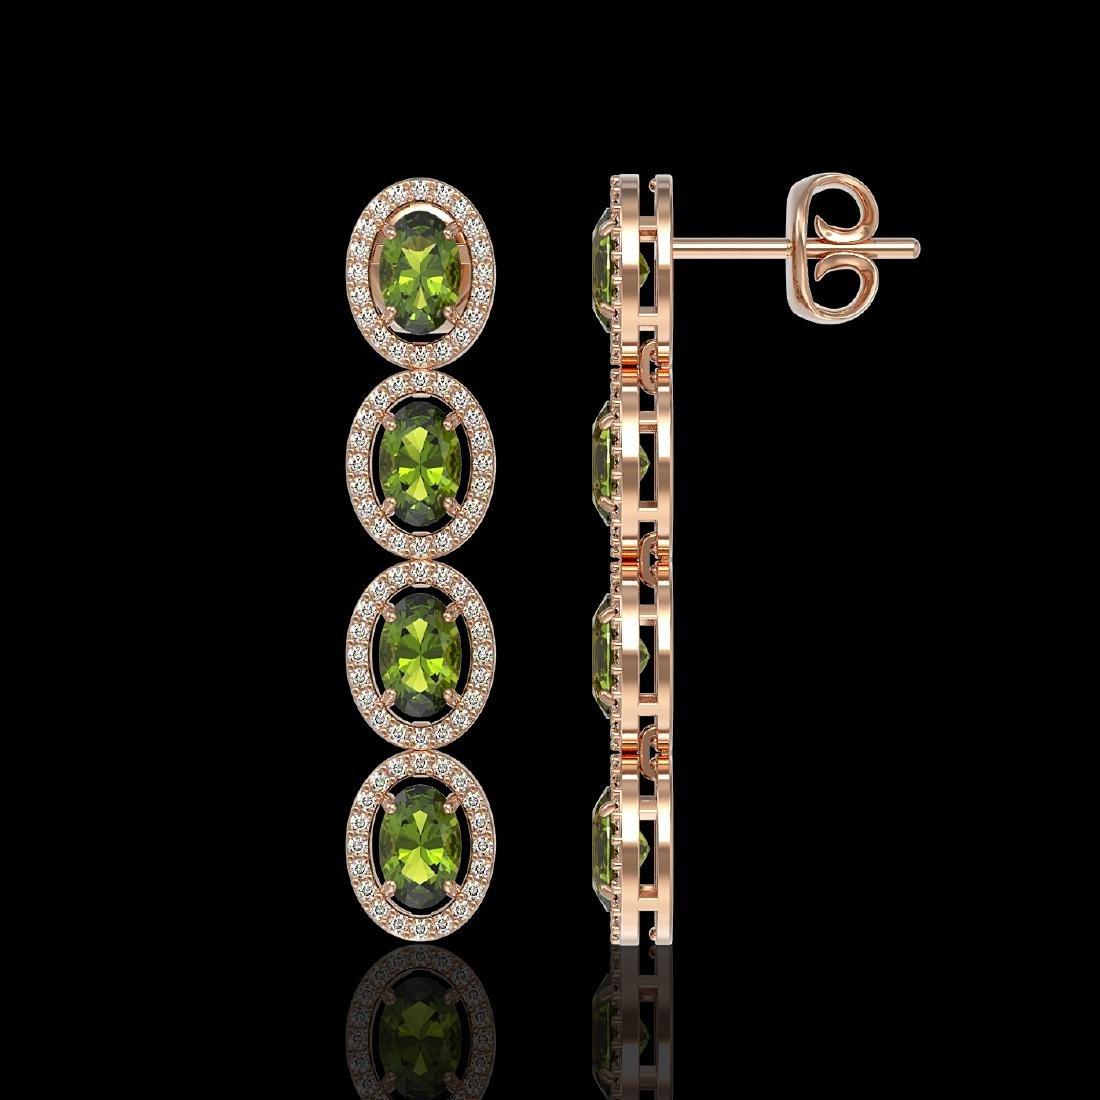 5.88 CTW Tourmaline & Diamond Halo Earrings 10K Rose - 2